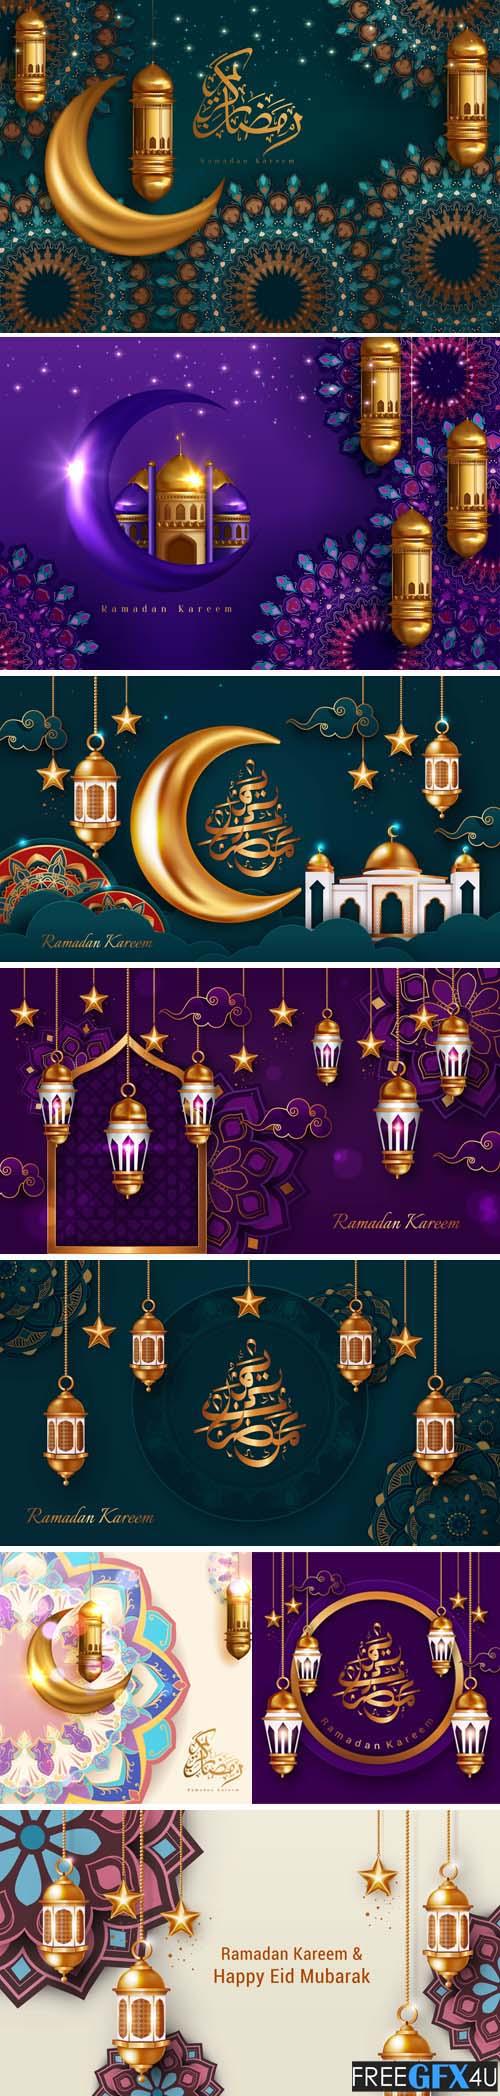 Ramadan Kareem Crescent backgrounds Golden Lantern